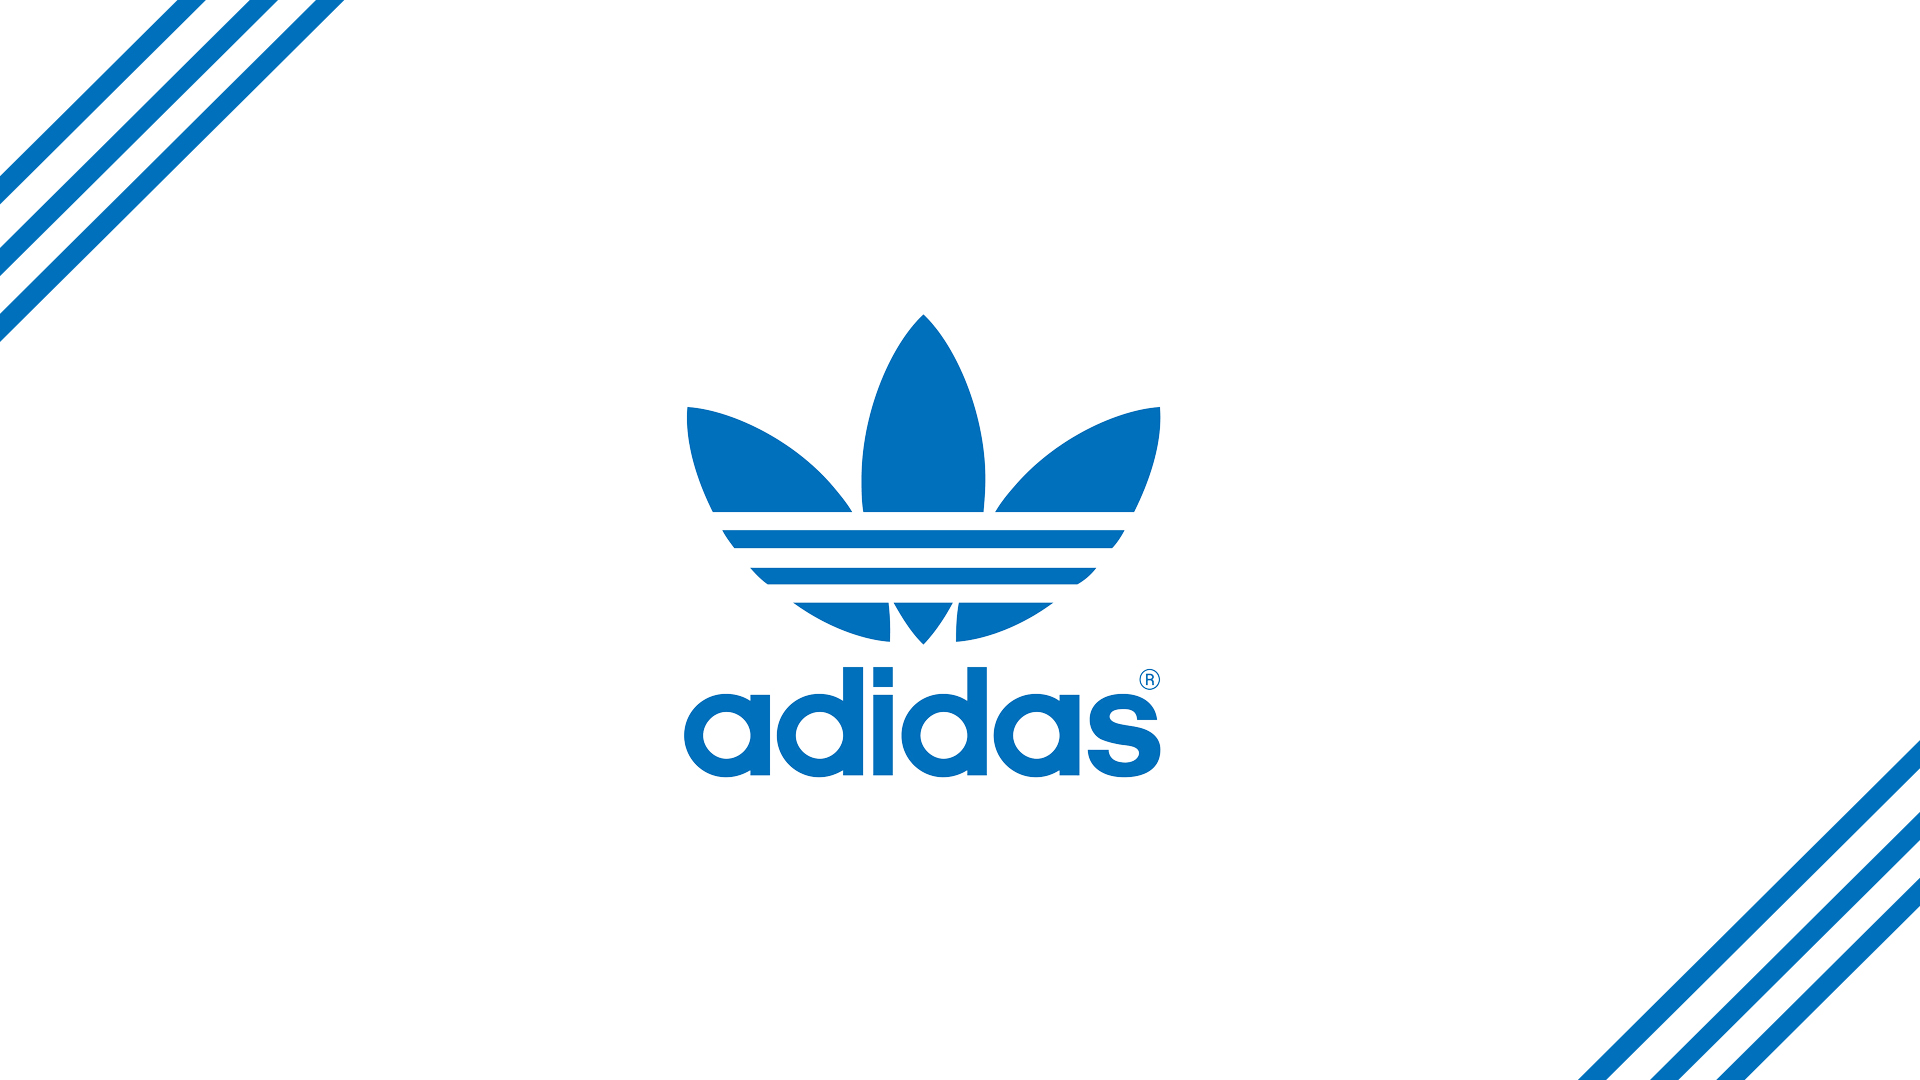 adidas blue logo 1920x1080 - photo #4